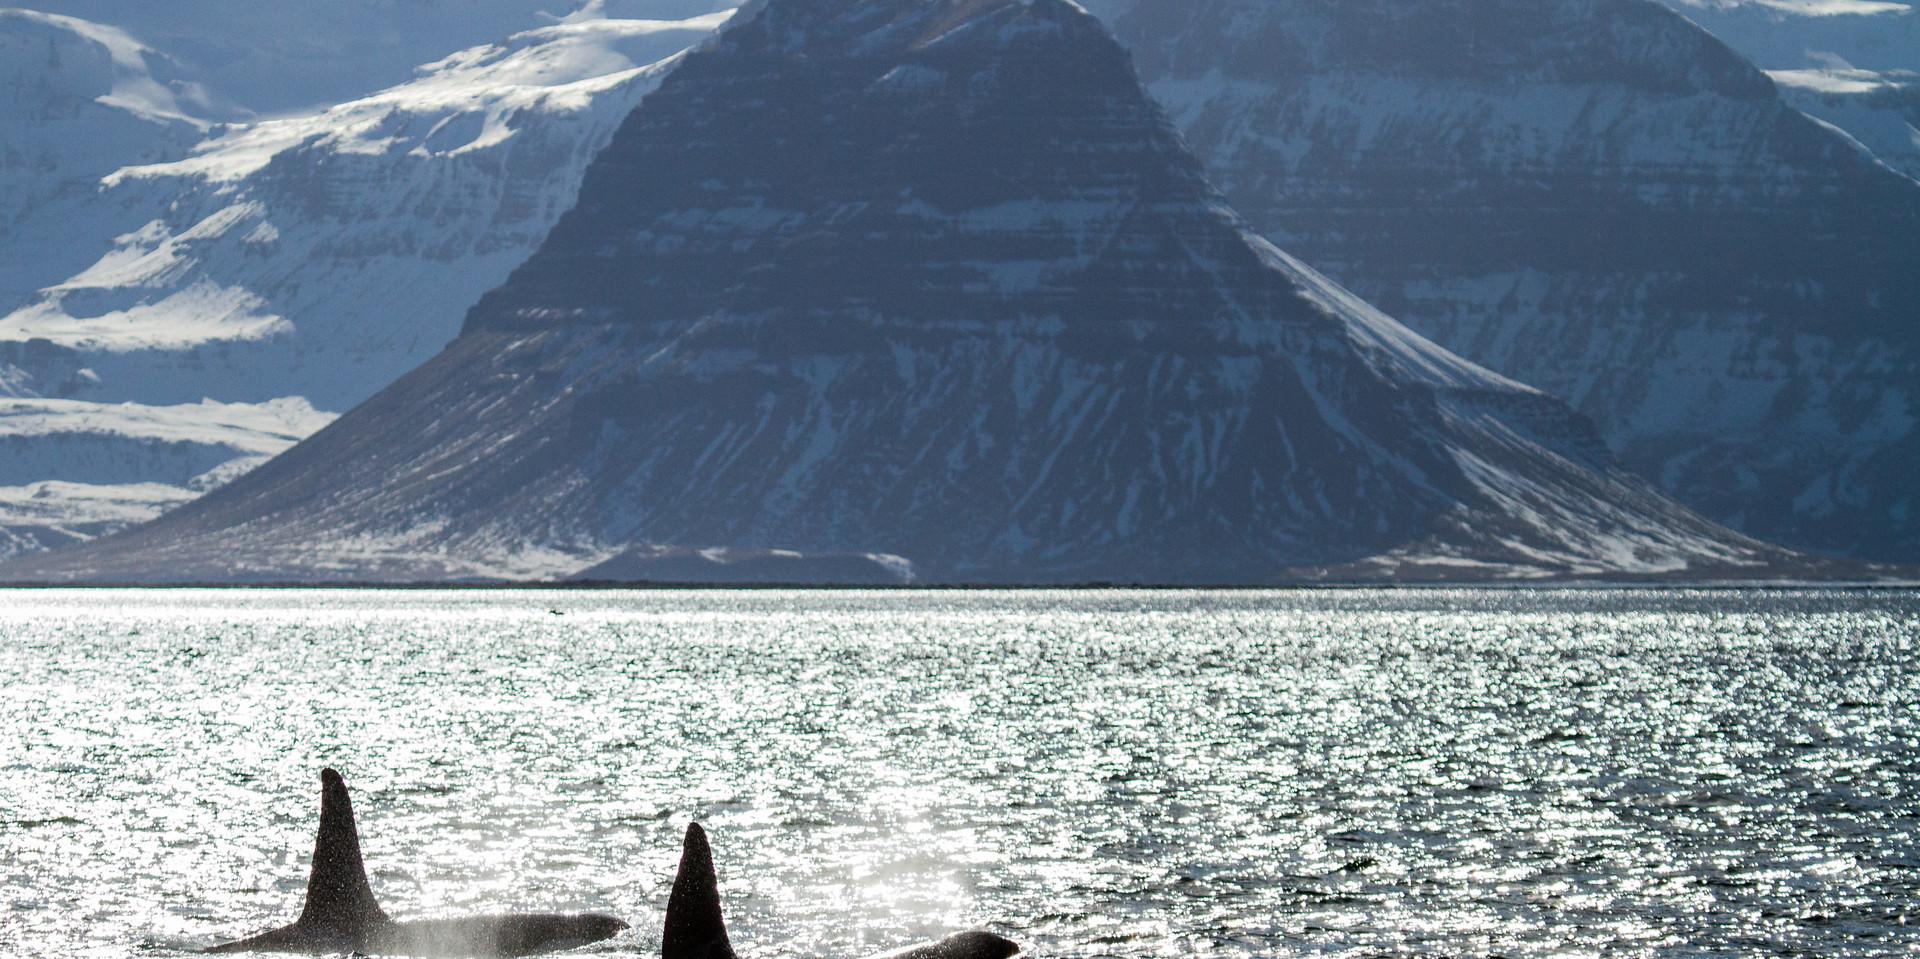 Iceland-Snaefellsnes-William Gray-2.jpg